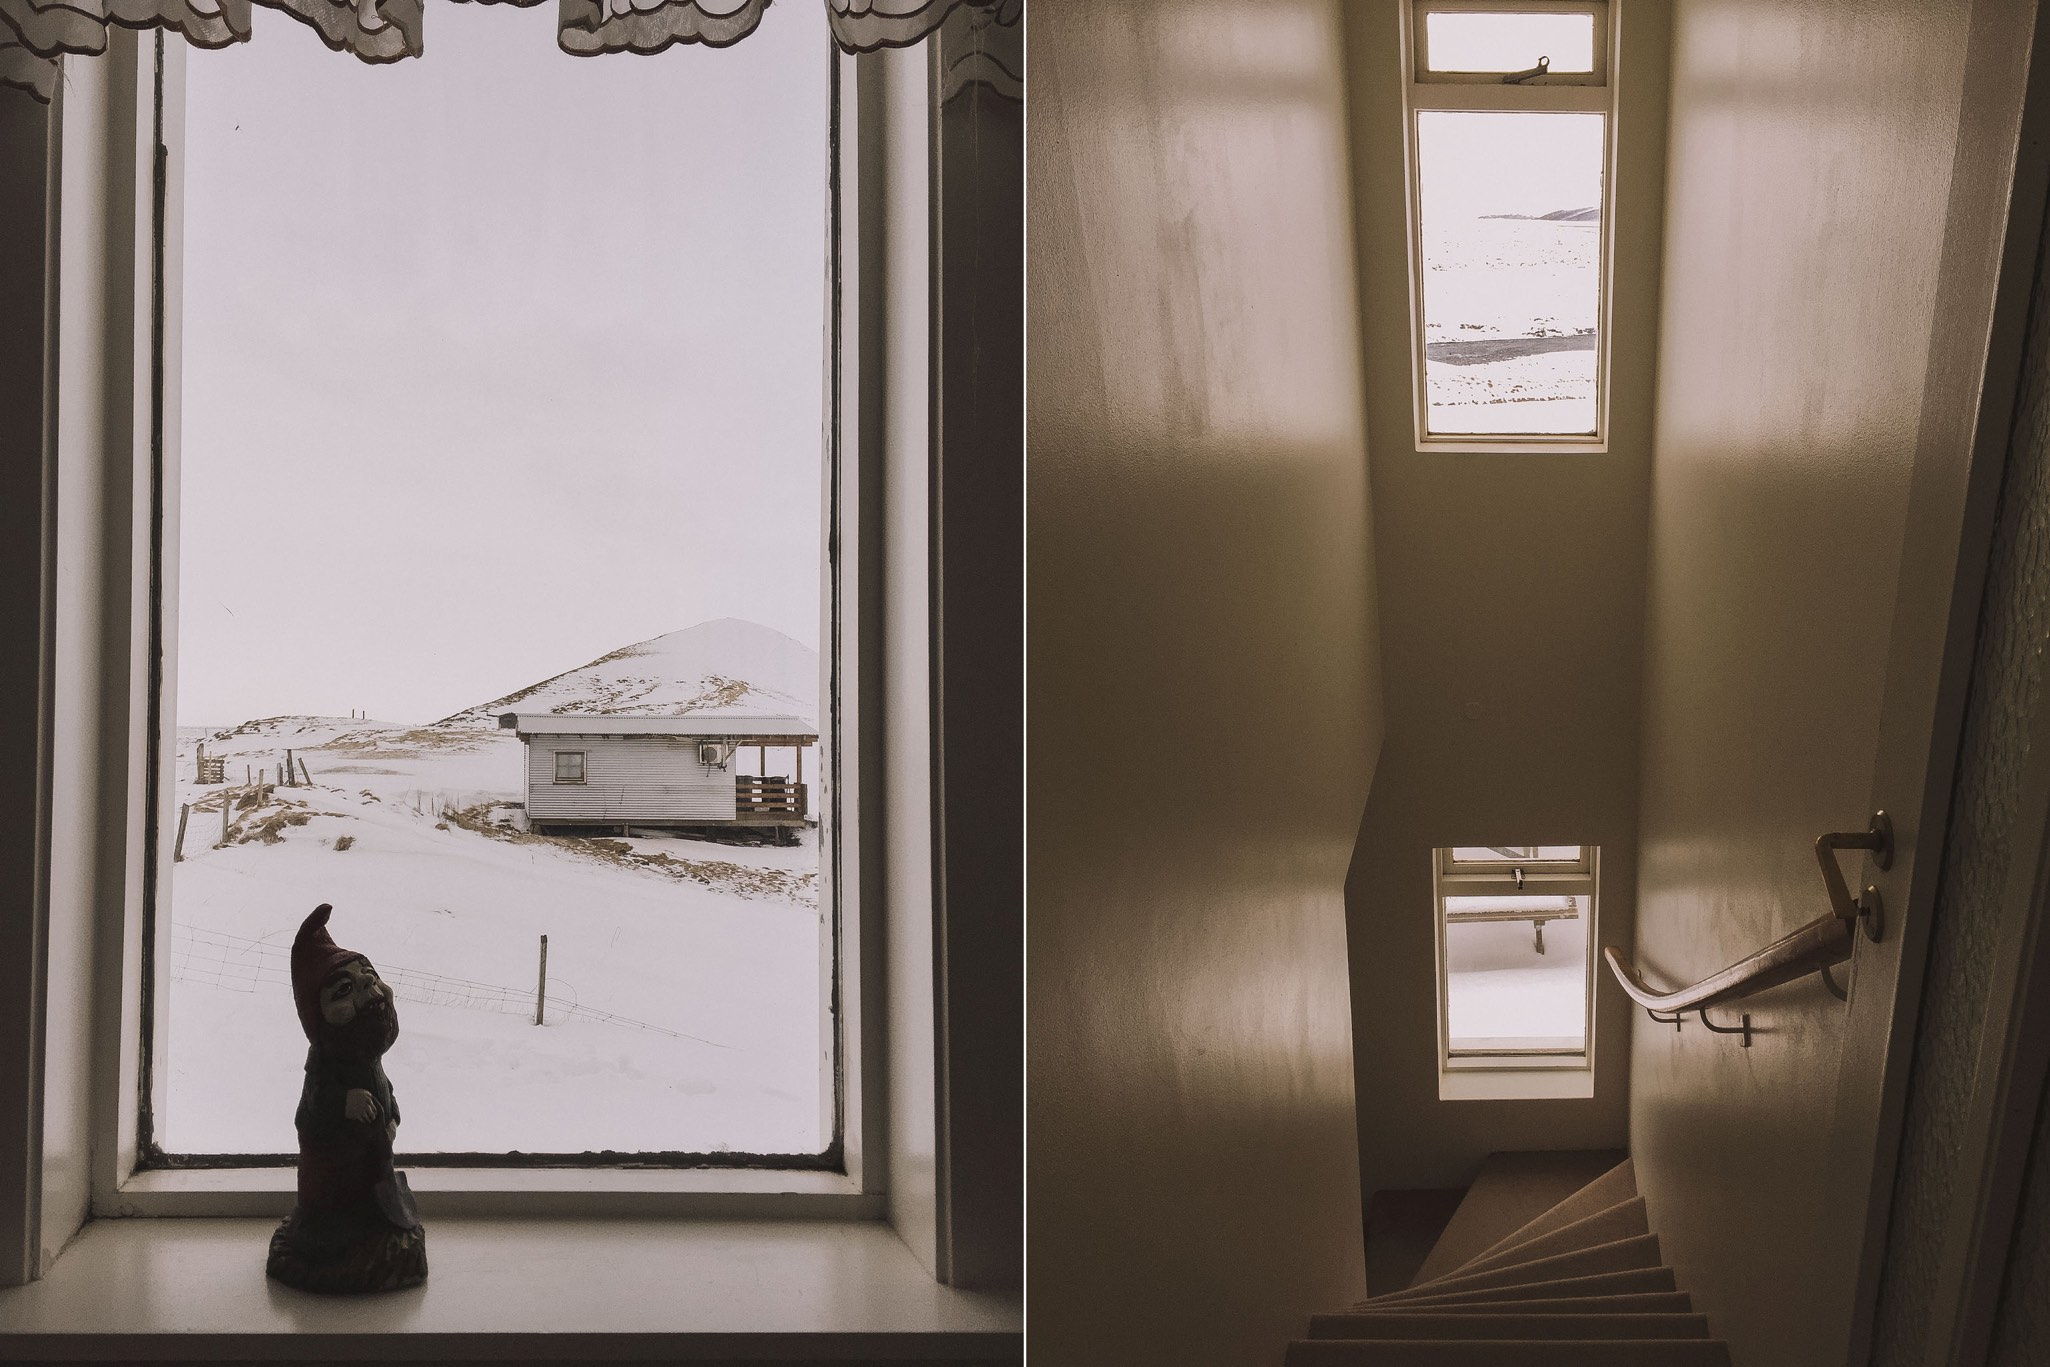 Road-trip-Islande-Iceland-Voyage-Travel-Portrait-Jérémy-Boyer-Skaftafell-16.jpg